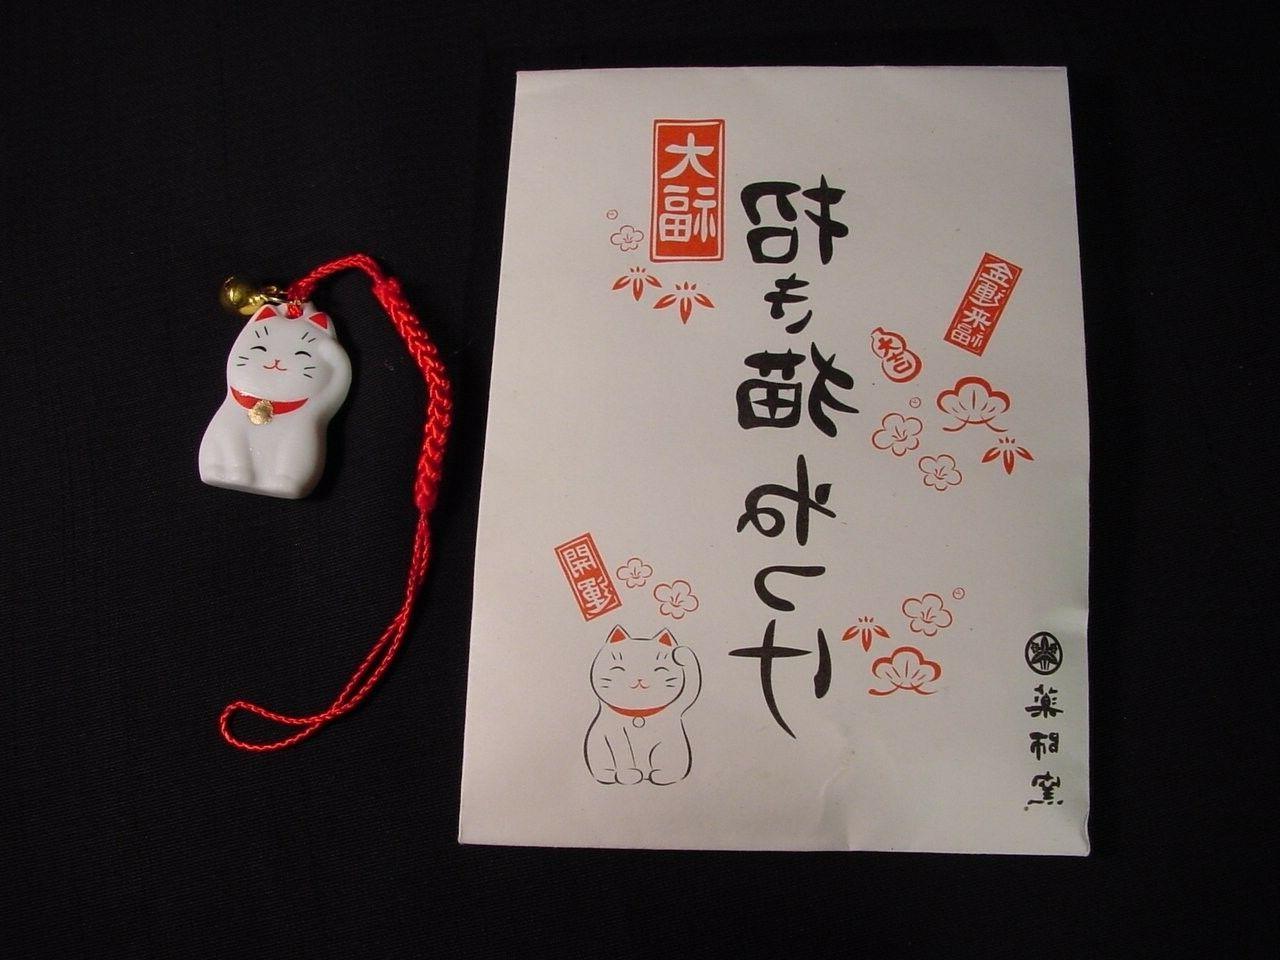 MANEKI Beckoning Cat Cell Strap Keychain Charm & Sleeve